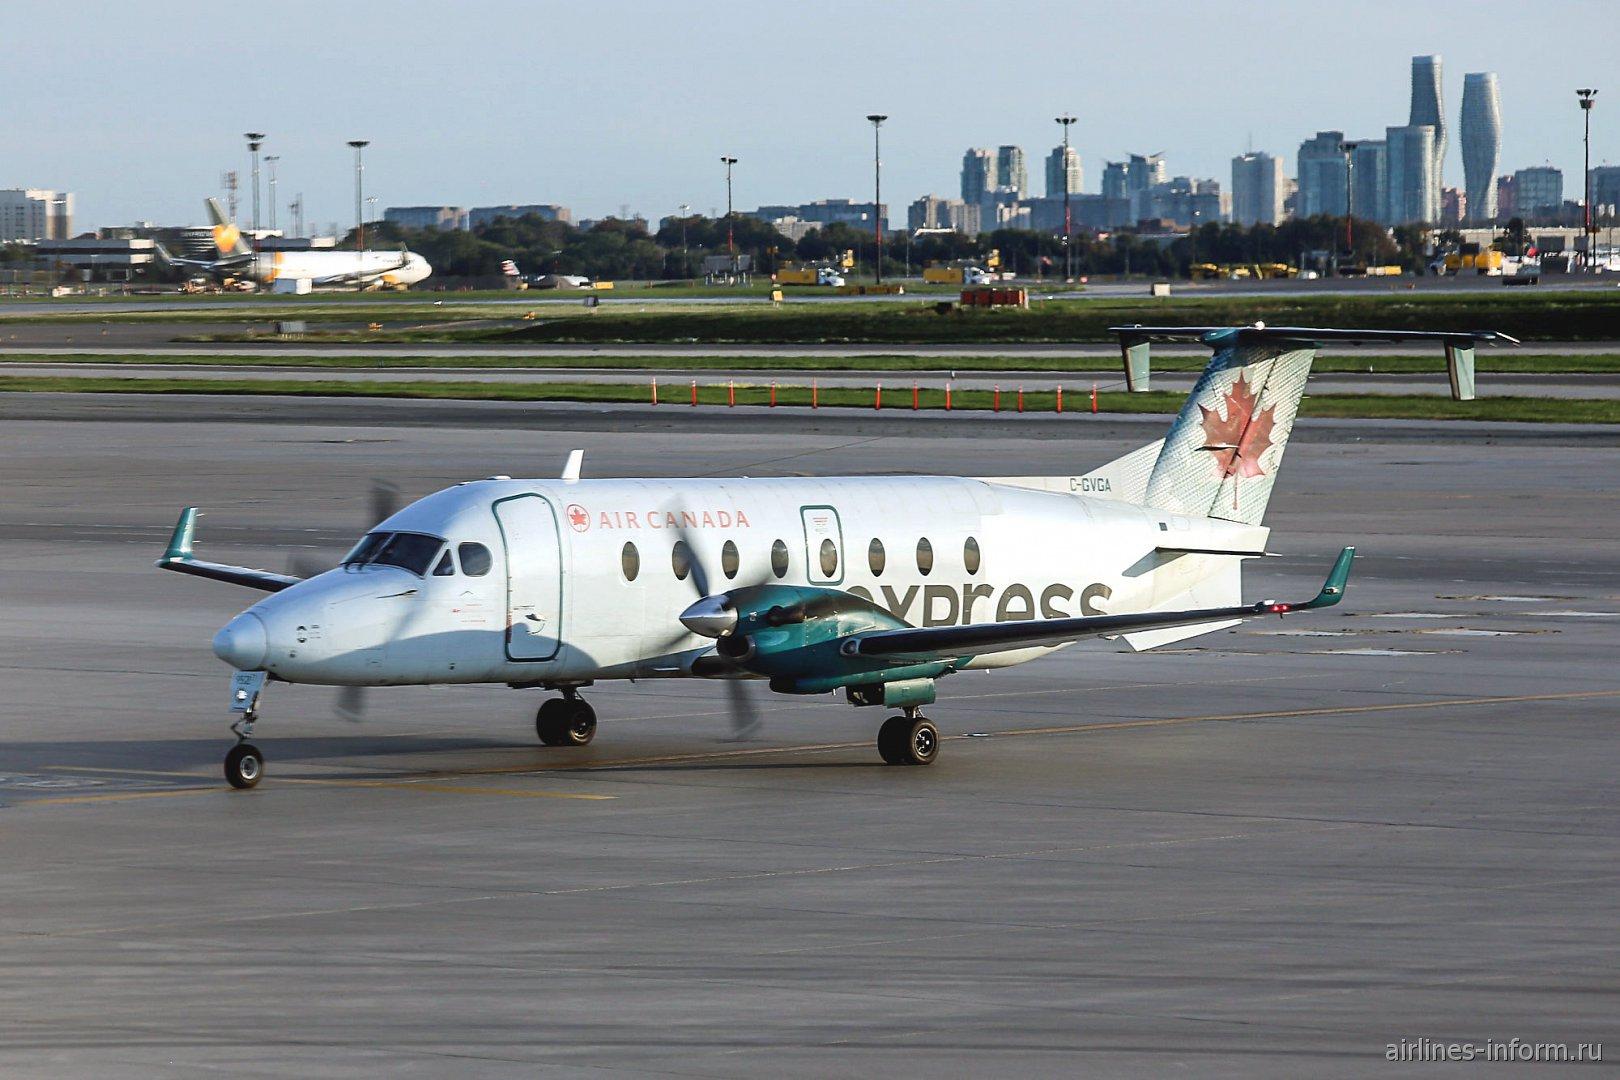 Самолет Beechcraft 1900D C-GVGA авиакомпании Air Georgian в аэропорту Торонто Пирсон